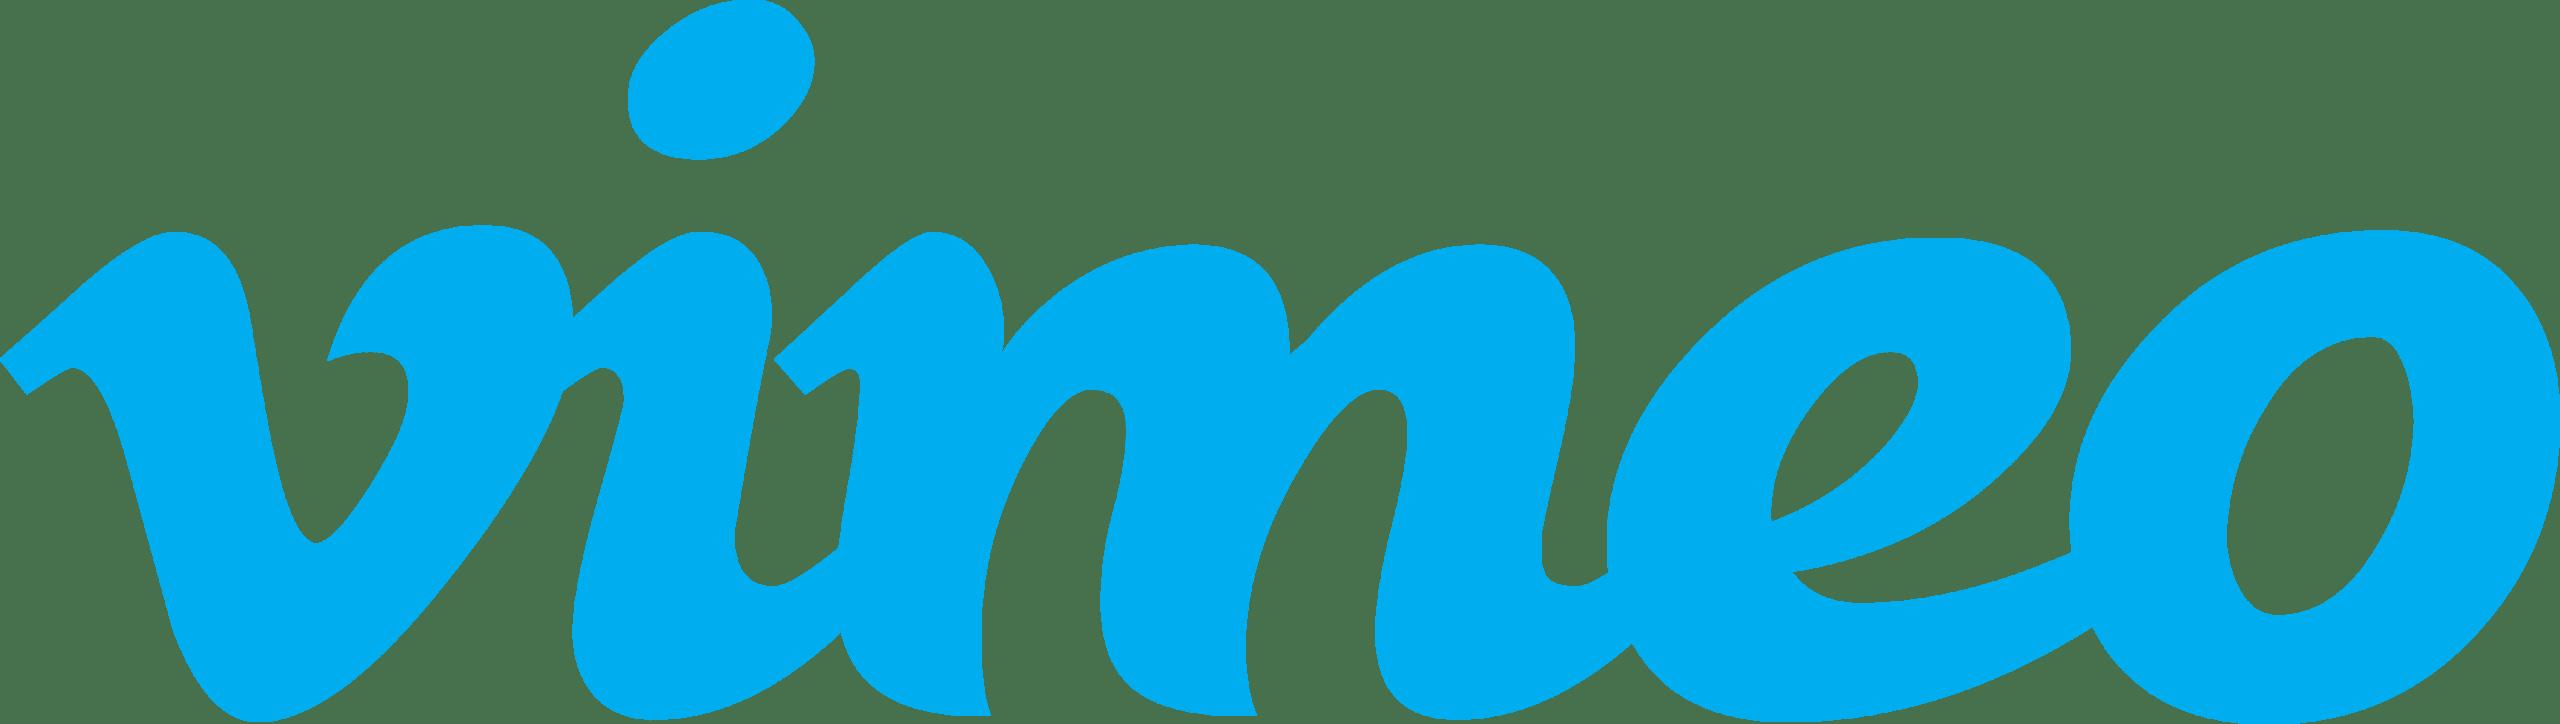 vemio - Project Free TV